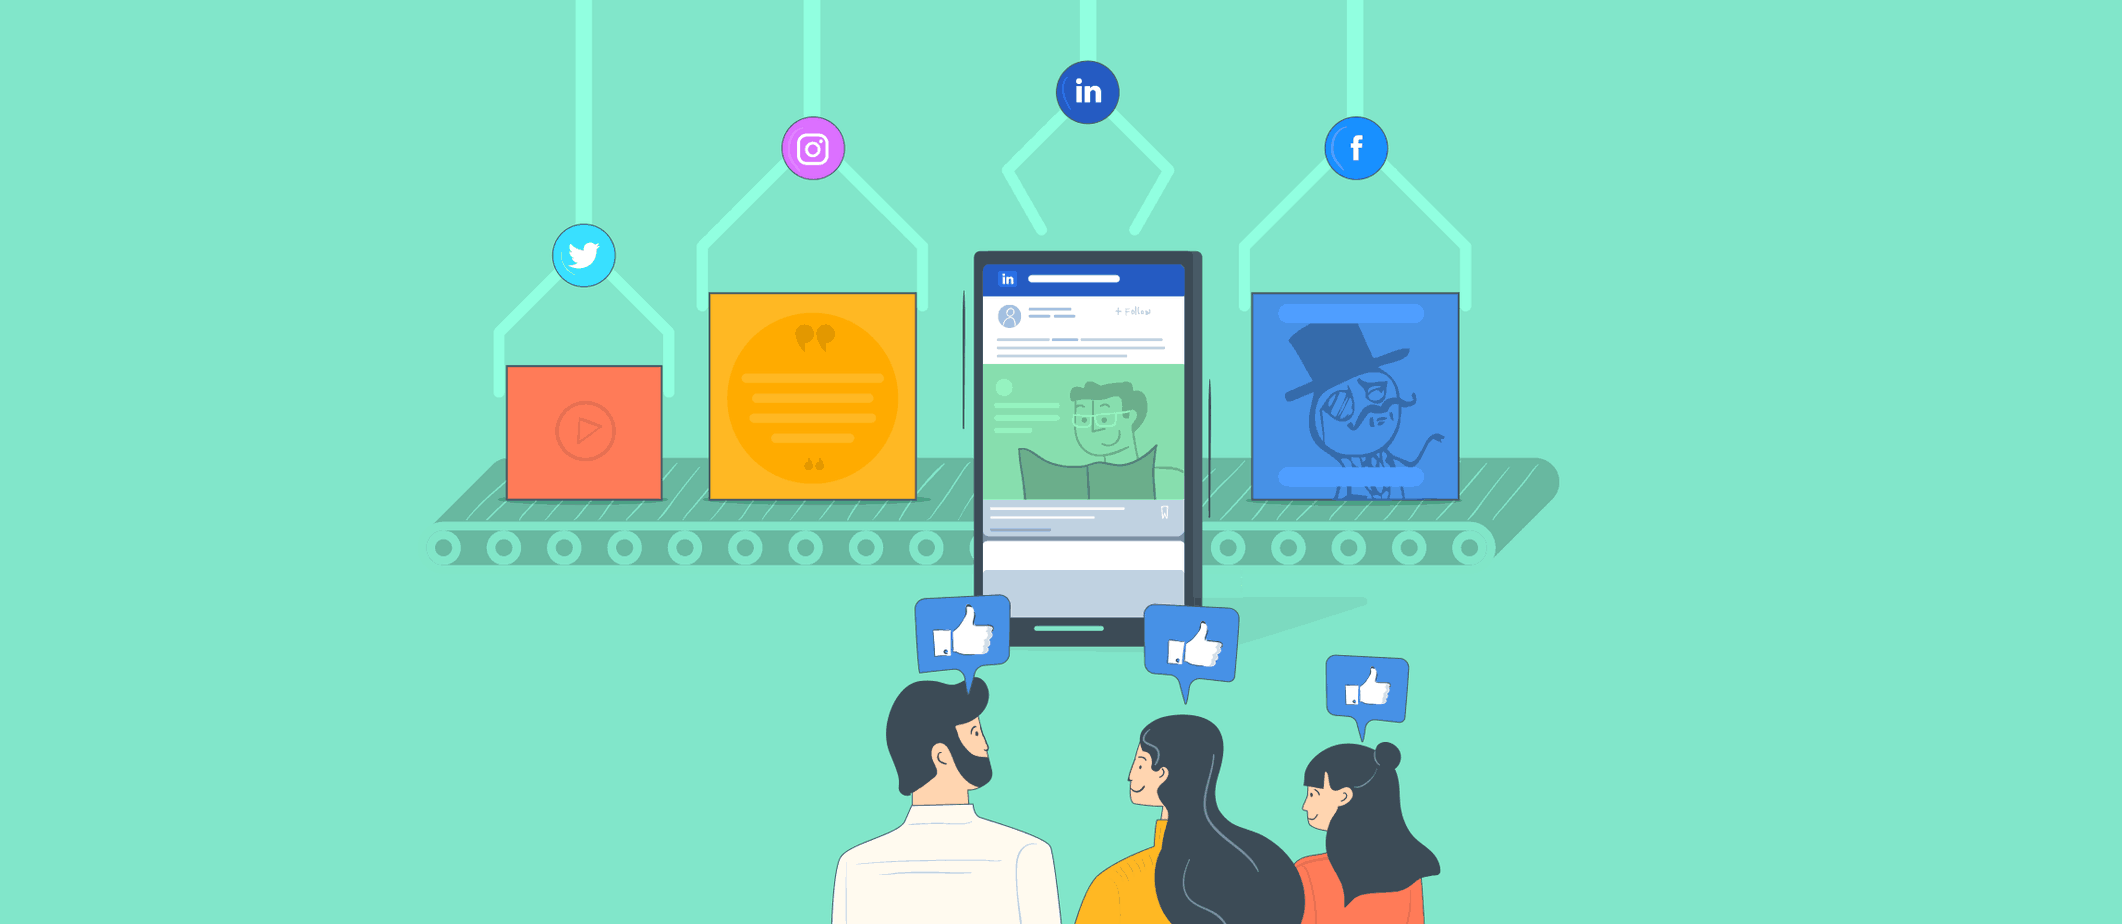 visual-content-for-social-media